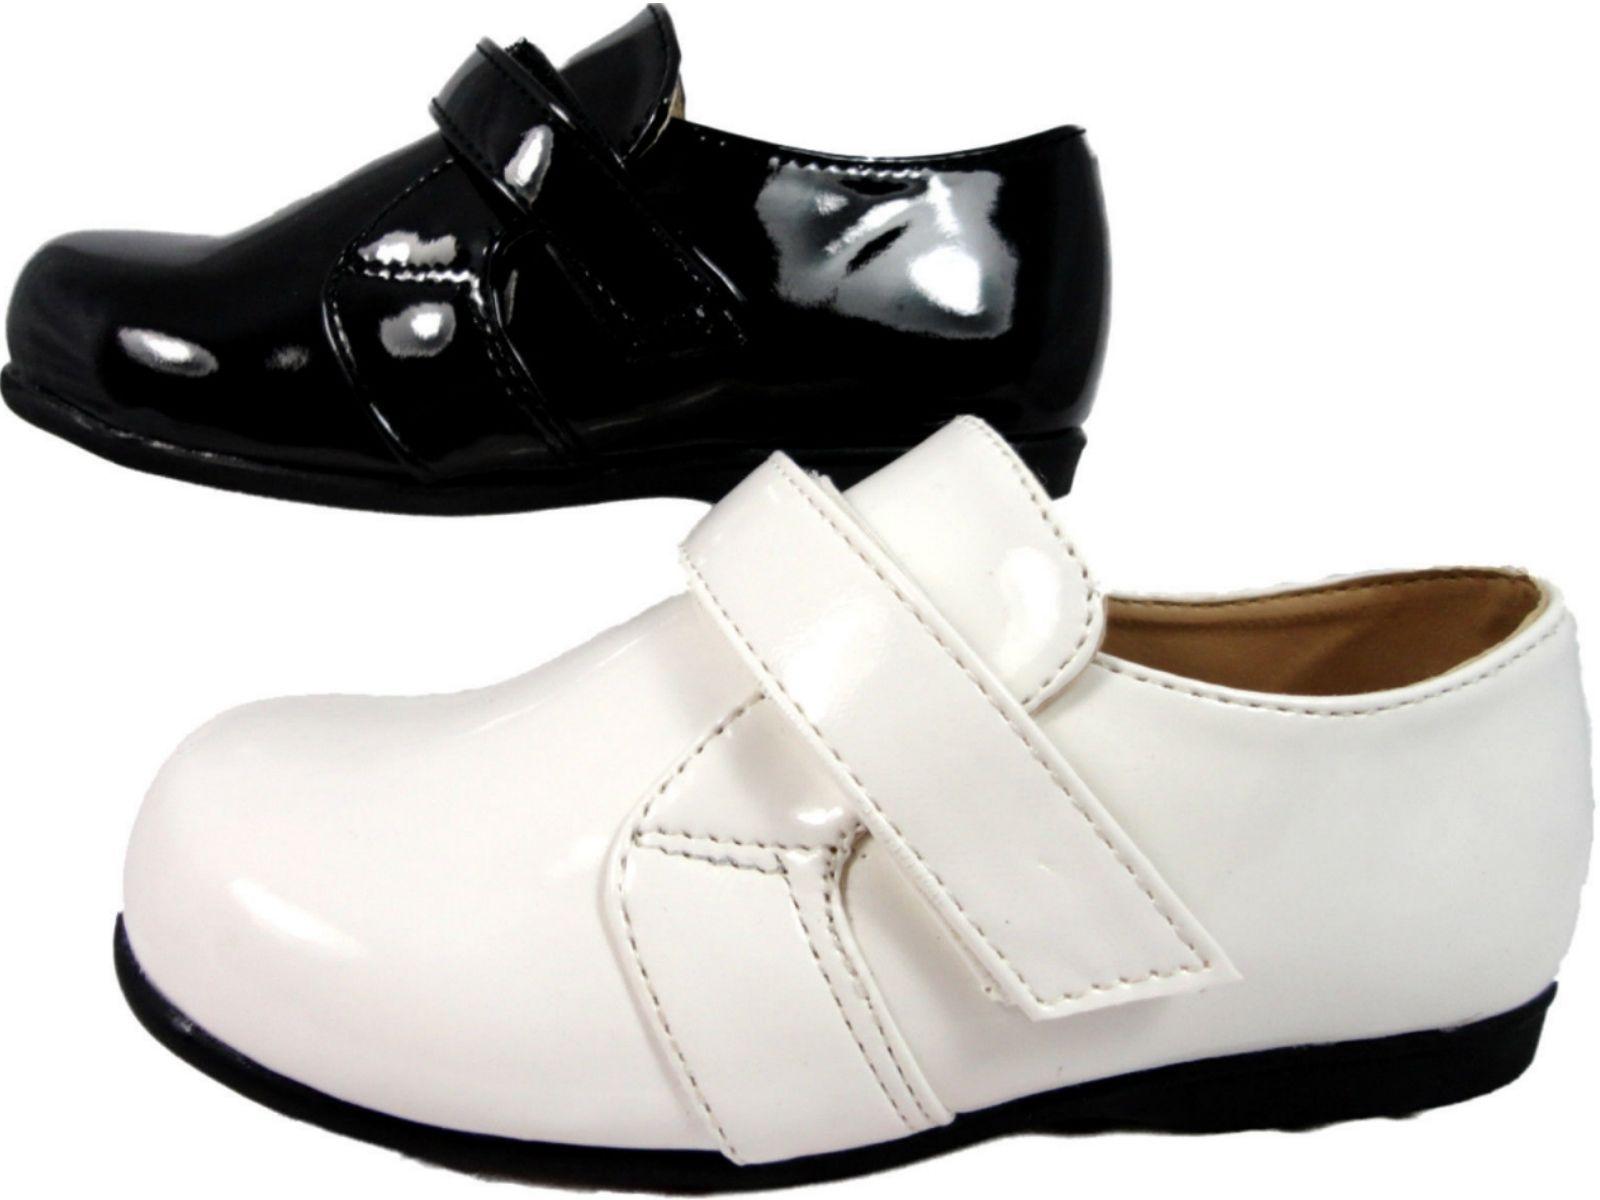 Infant Boys Wedding Page Boy Confirmation Patent Black White Shoes